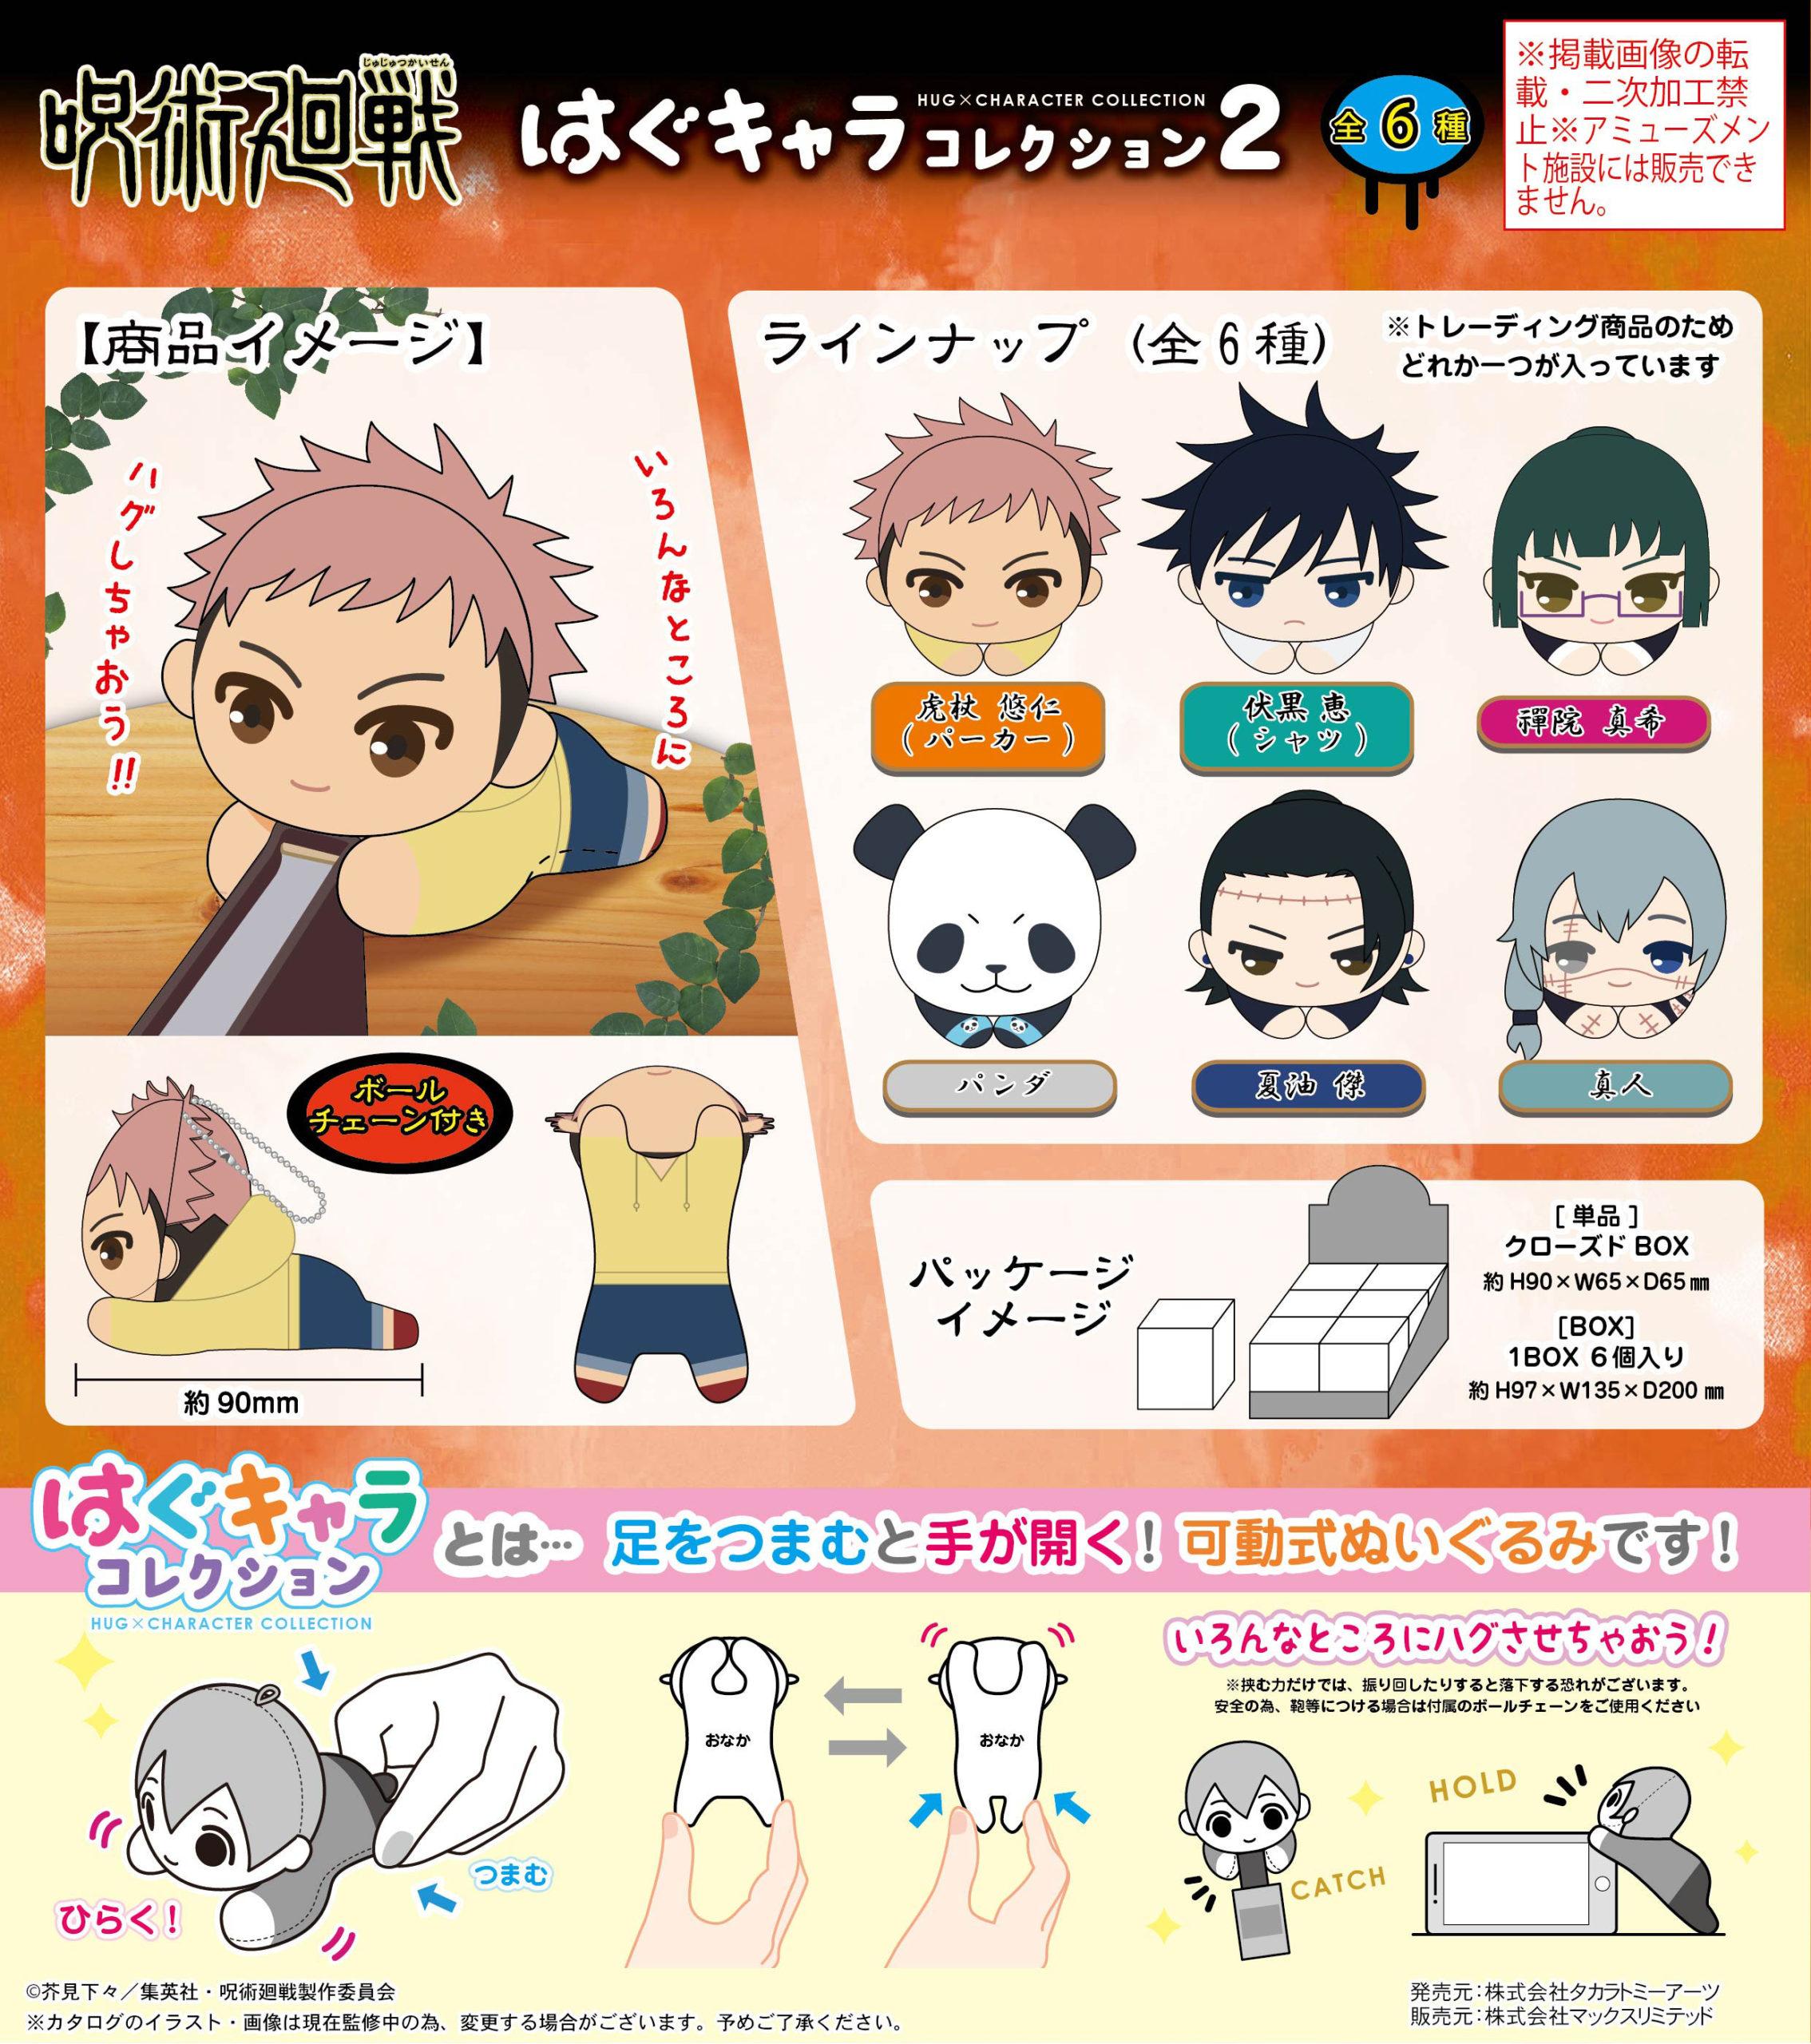 Jujutsu Kaisen Hug X Character Vol 2. Tomy Takara Random Blind Box Plush Doll